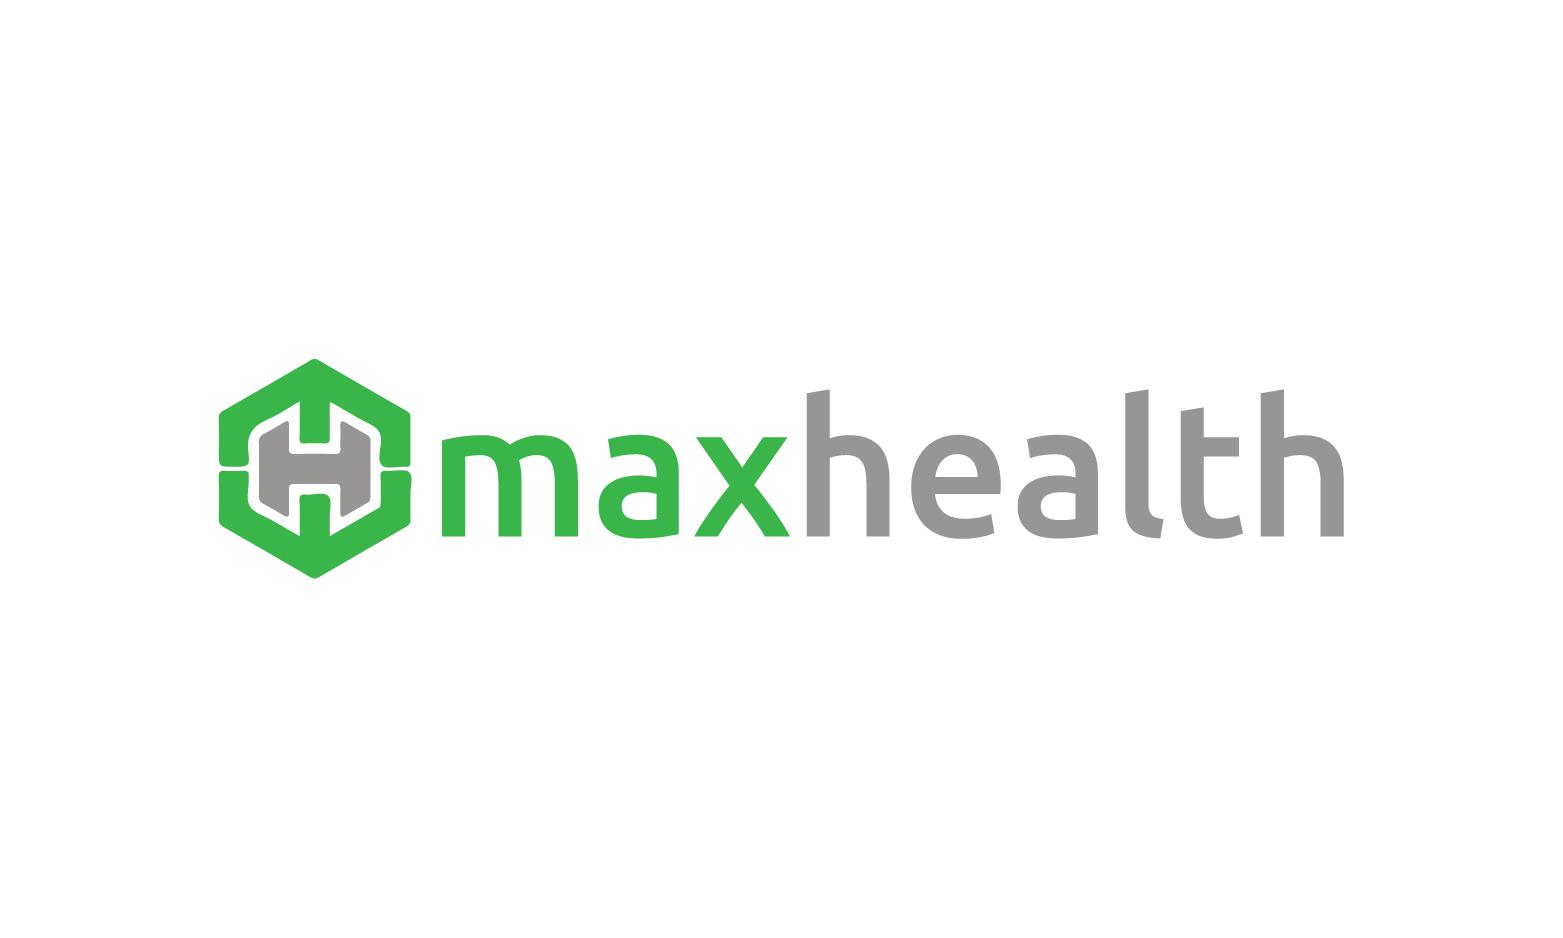 MaxHealth.co